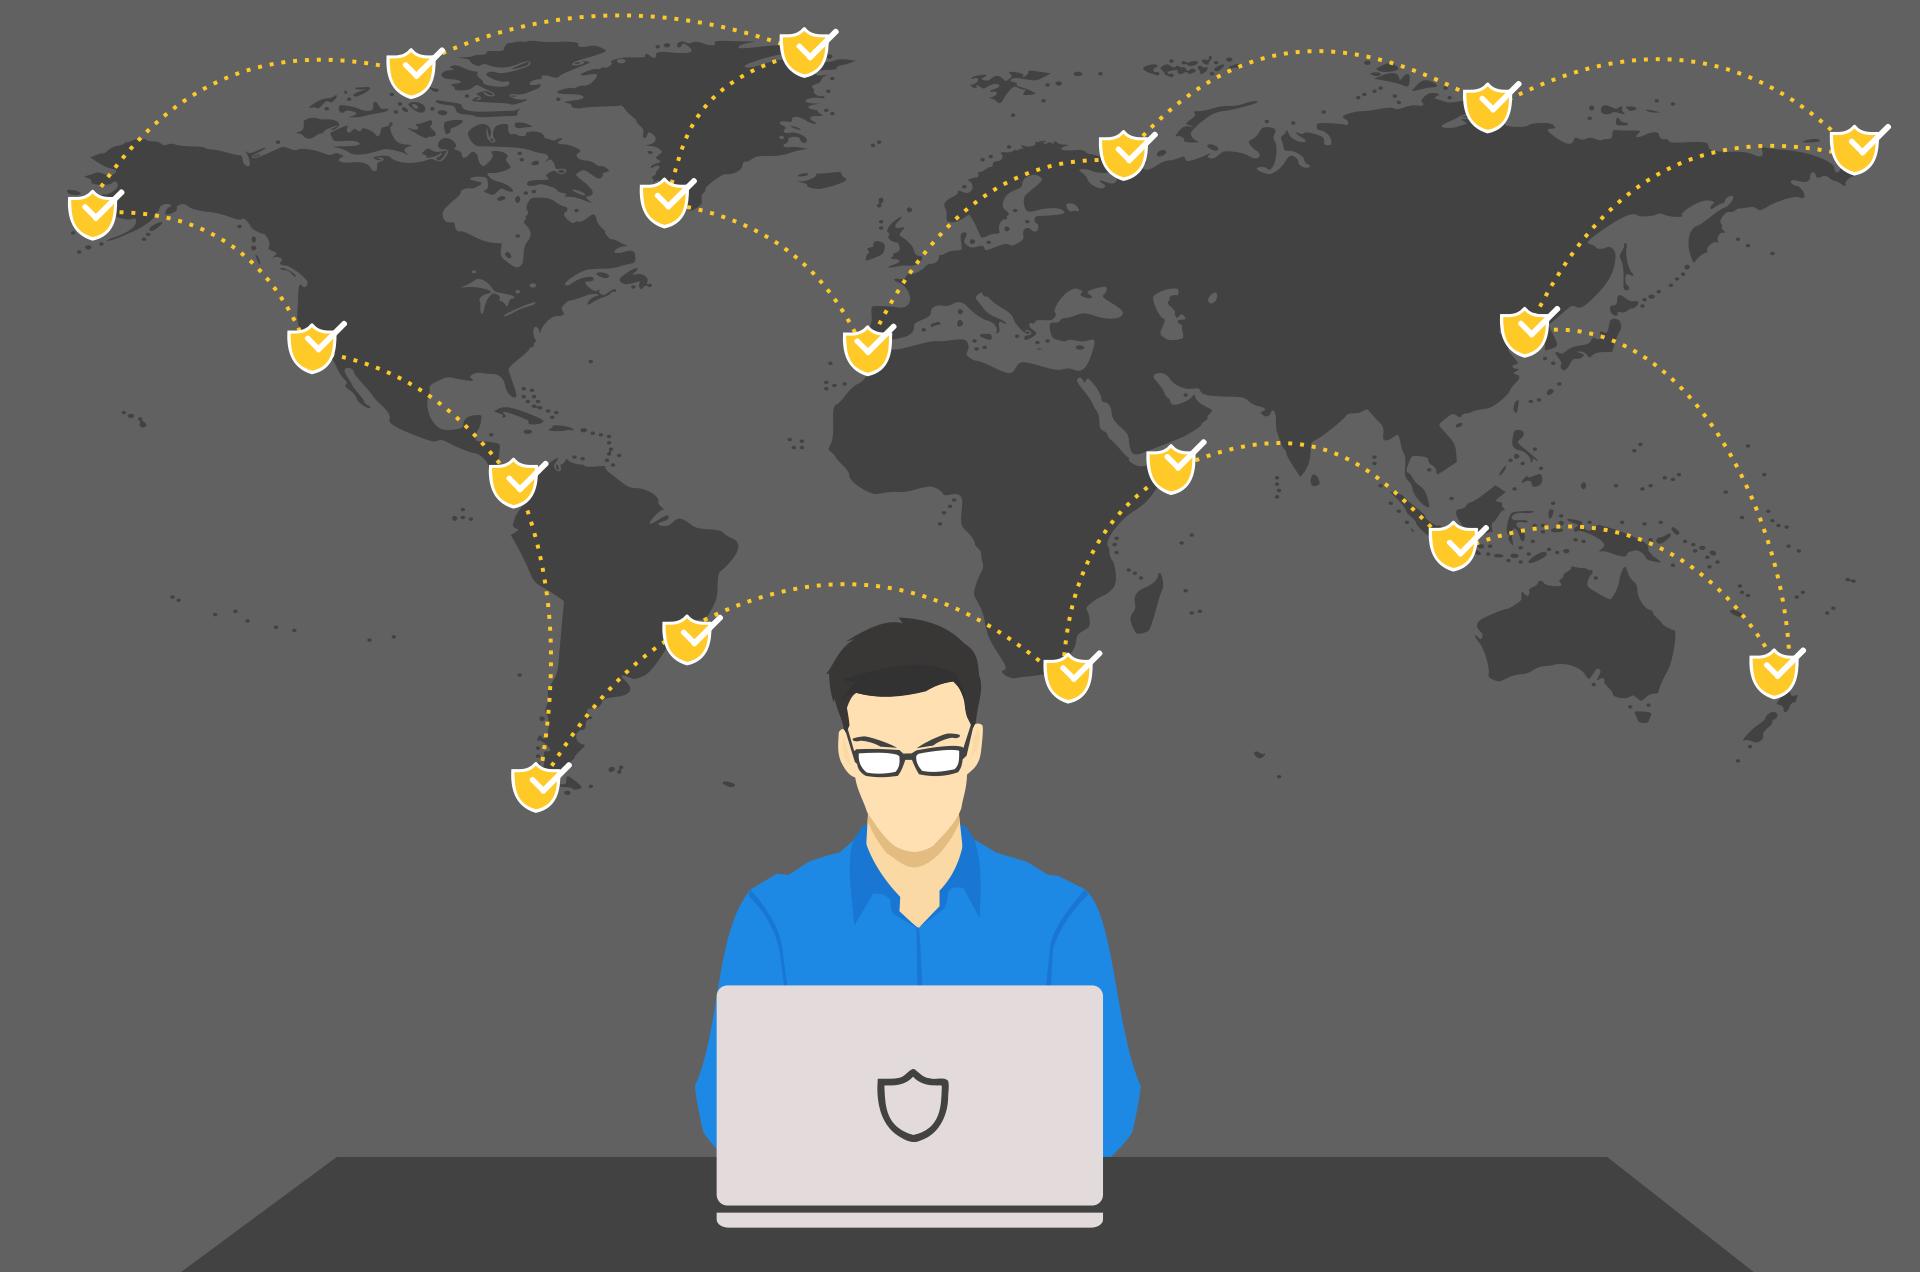 Security: Hosted or self-hosted e-commerce platform